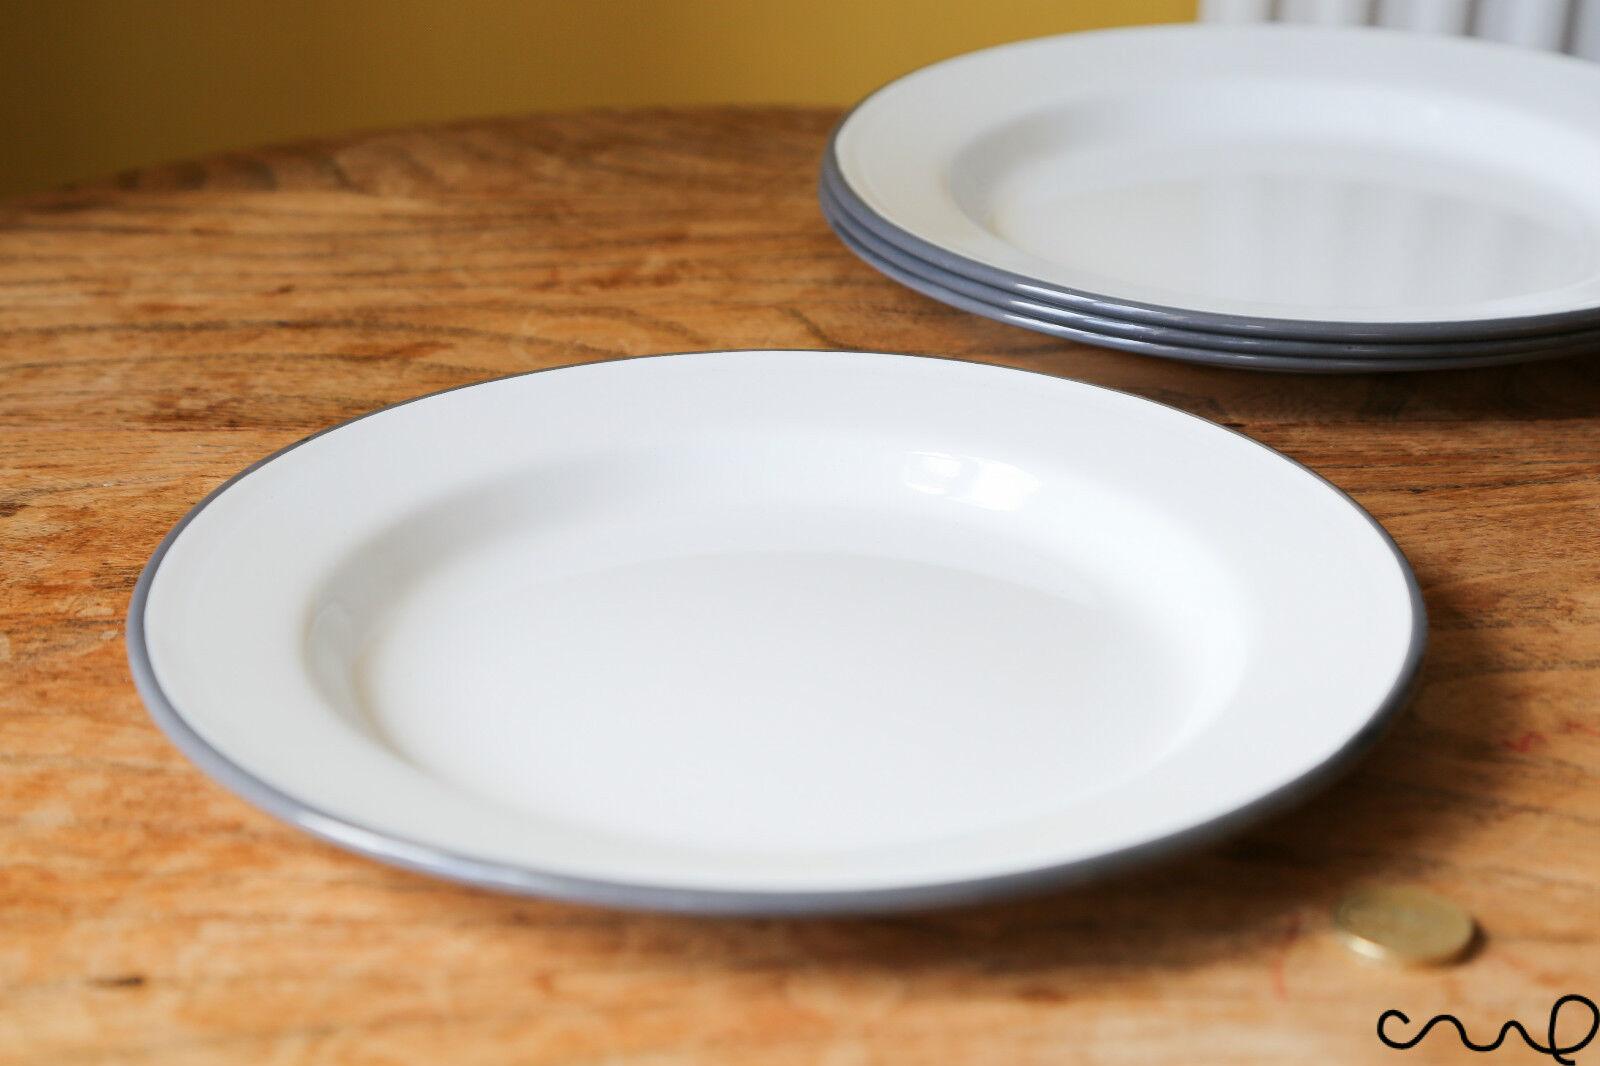 Falcon Enamelware 4 Plate Set Grey Rim 24cm Cooking Baking Oven Kitchenware VAT